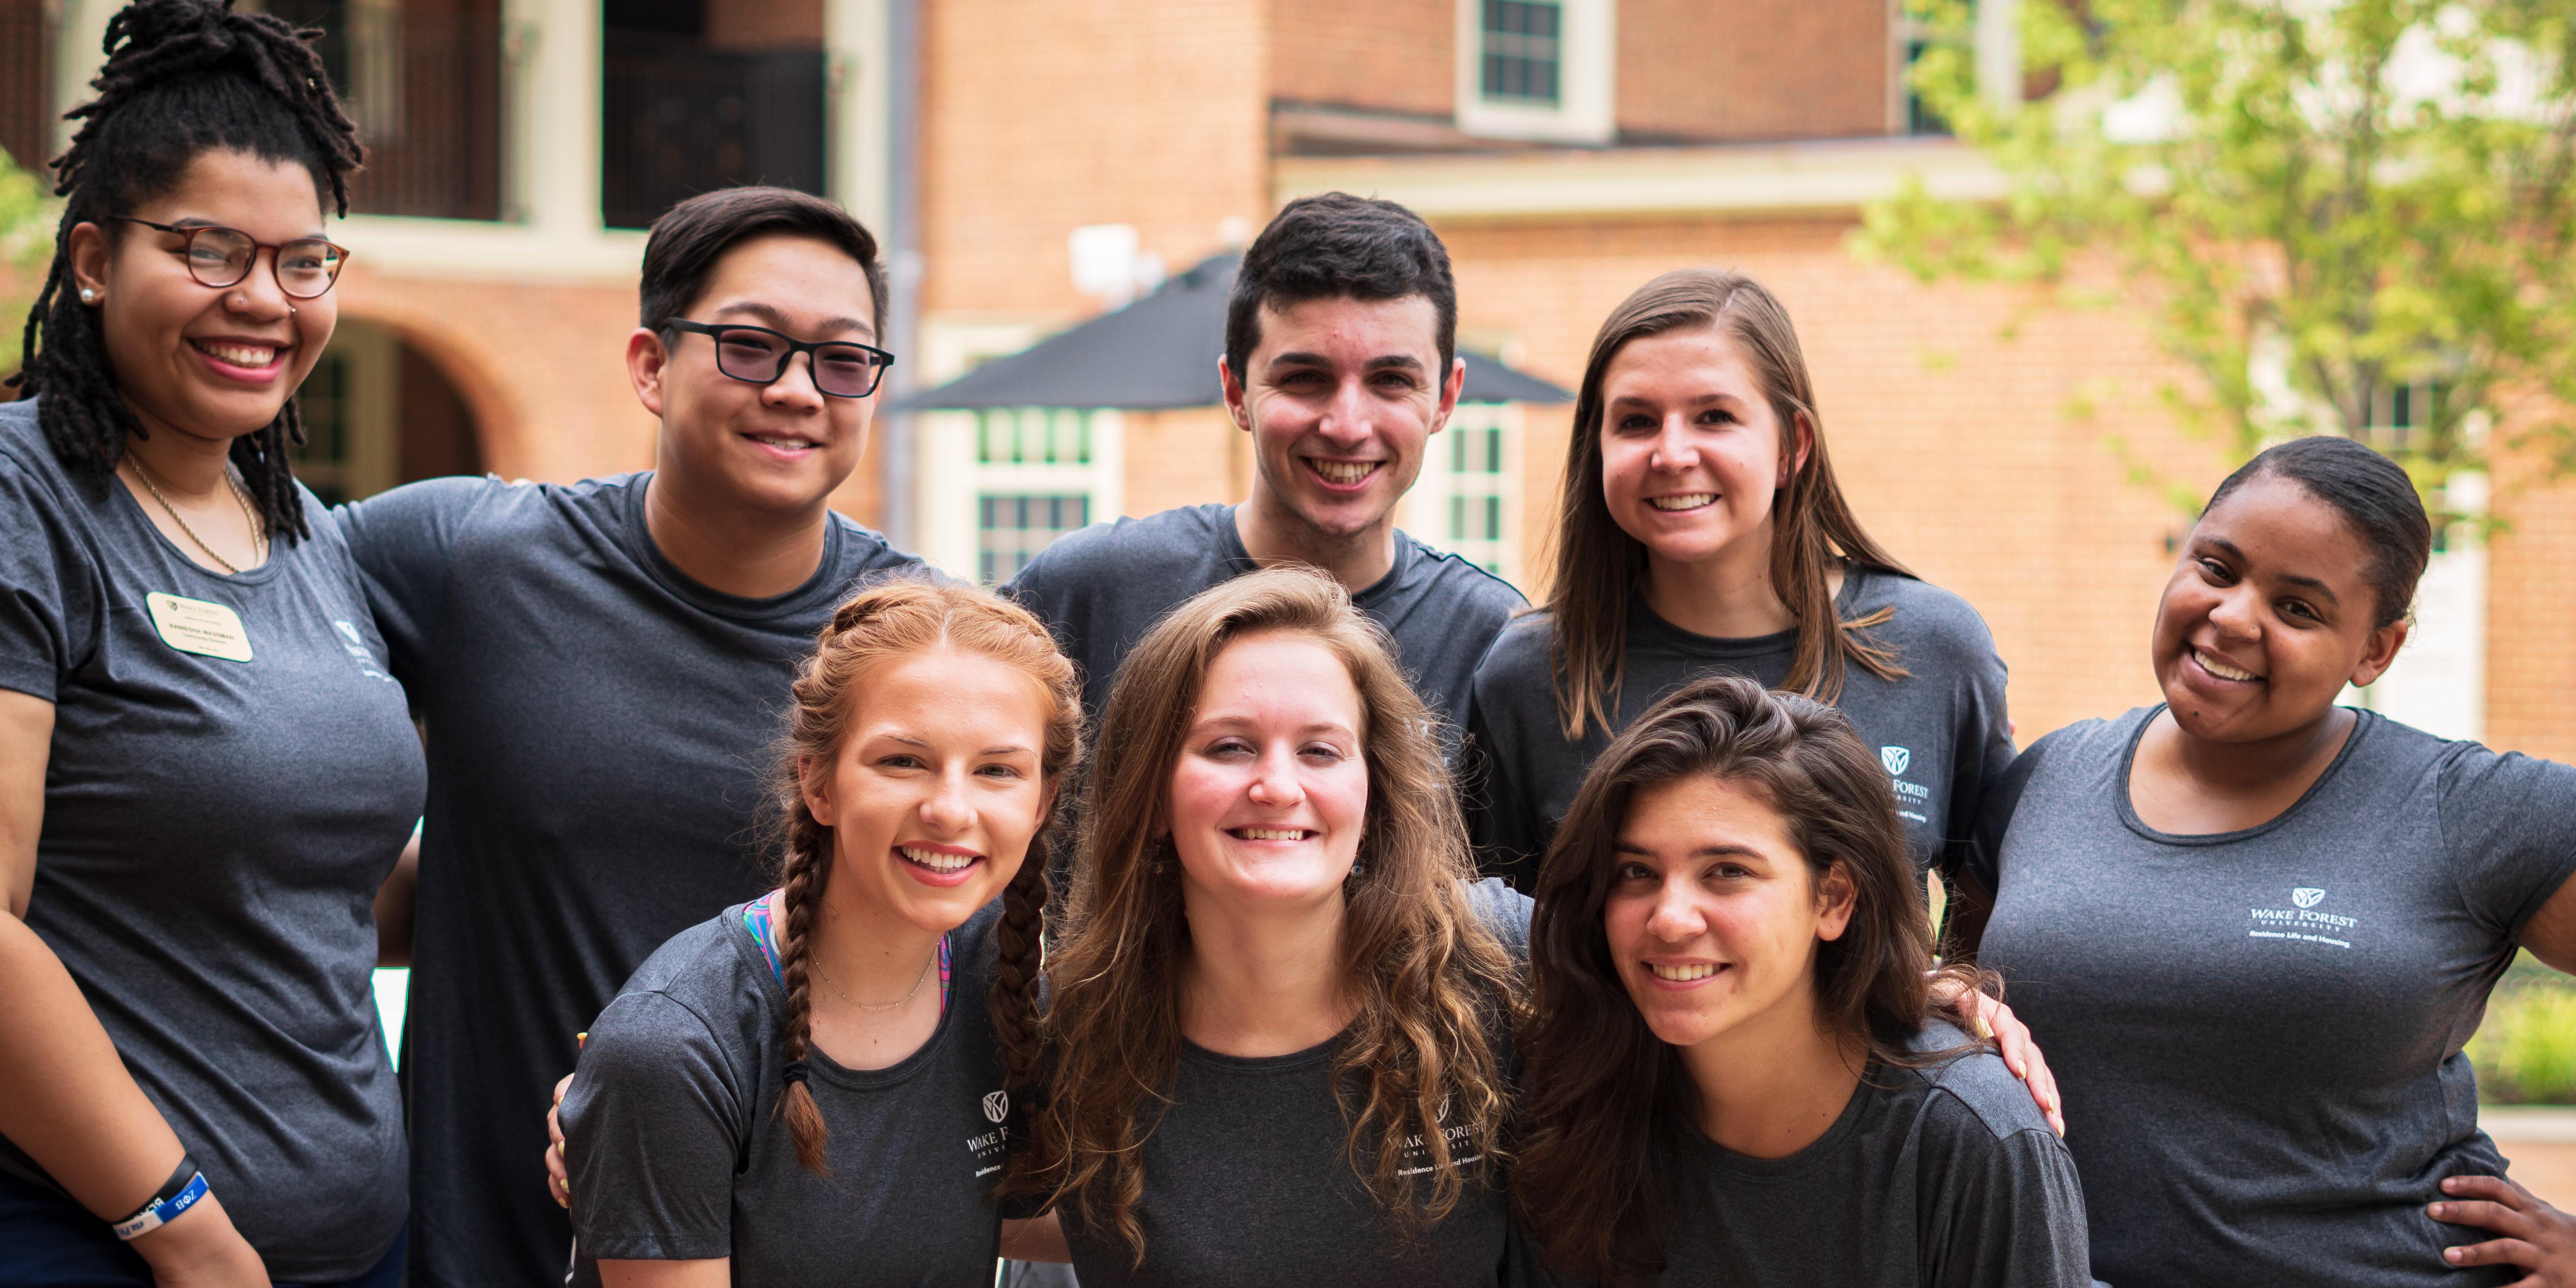 Taylor and Efird Hall Staff Group Photo